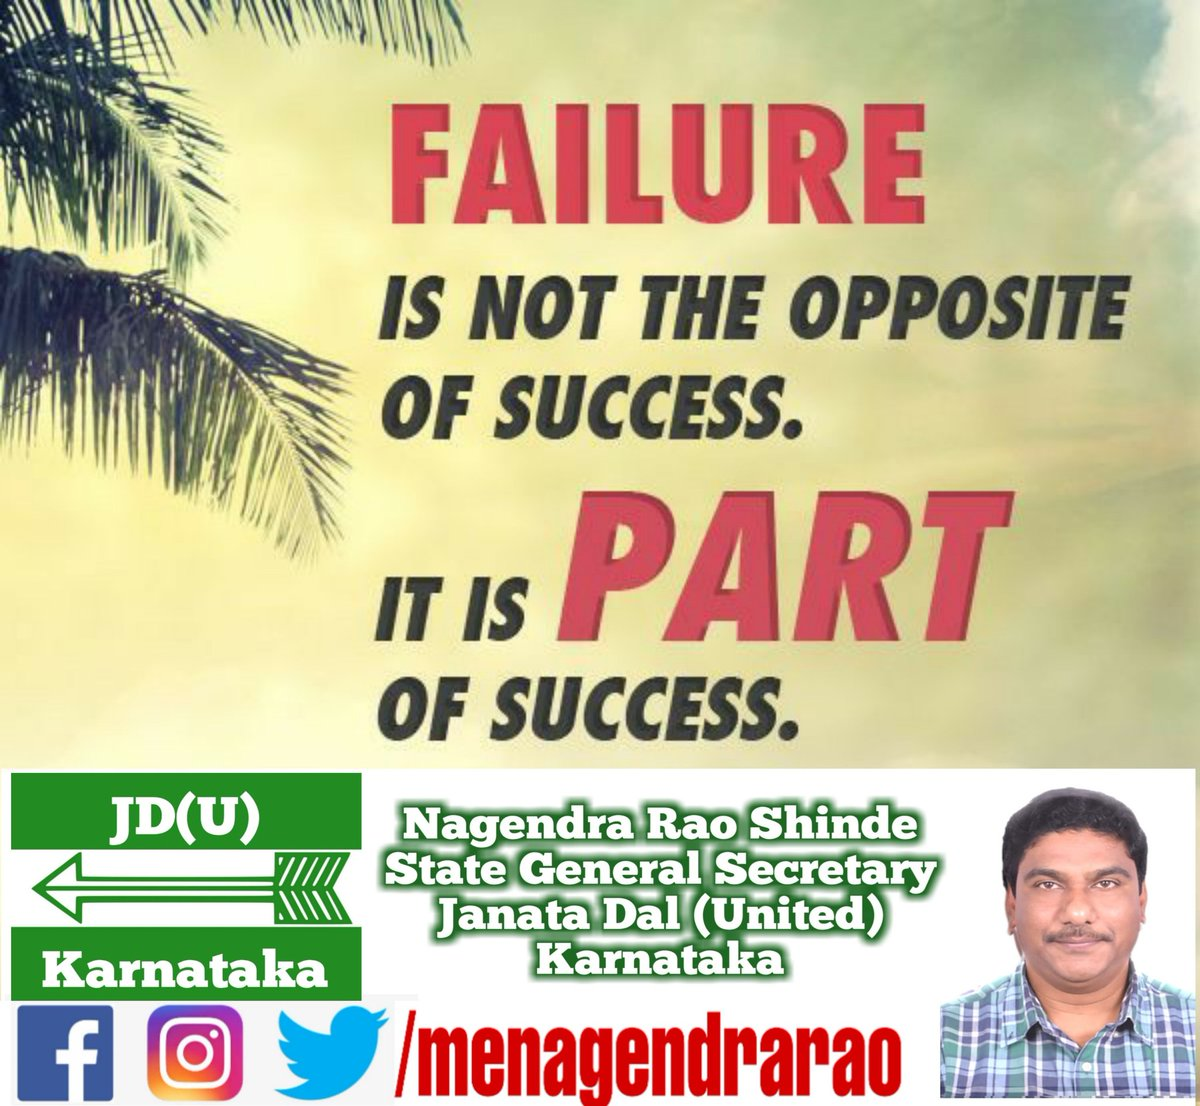 #mondaythoughts #JDU #Karnataka @gsecretaryjdu @NitishKumar @PrashantKishor @afaquejdu @RCP_Singh @SanjayJhaBihar @JDU_India @Jduonline @KCTyagiJDU @sanjaykumarjdu https://t.co/Ybjzlzgs33